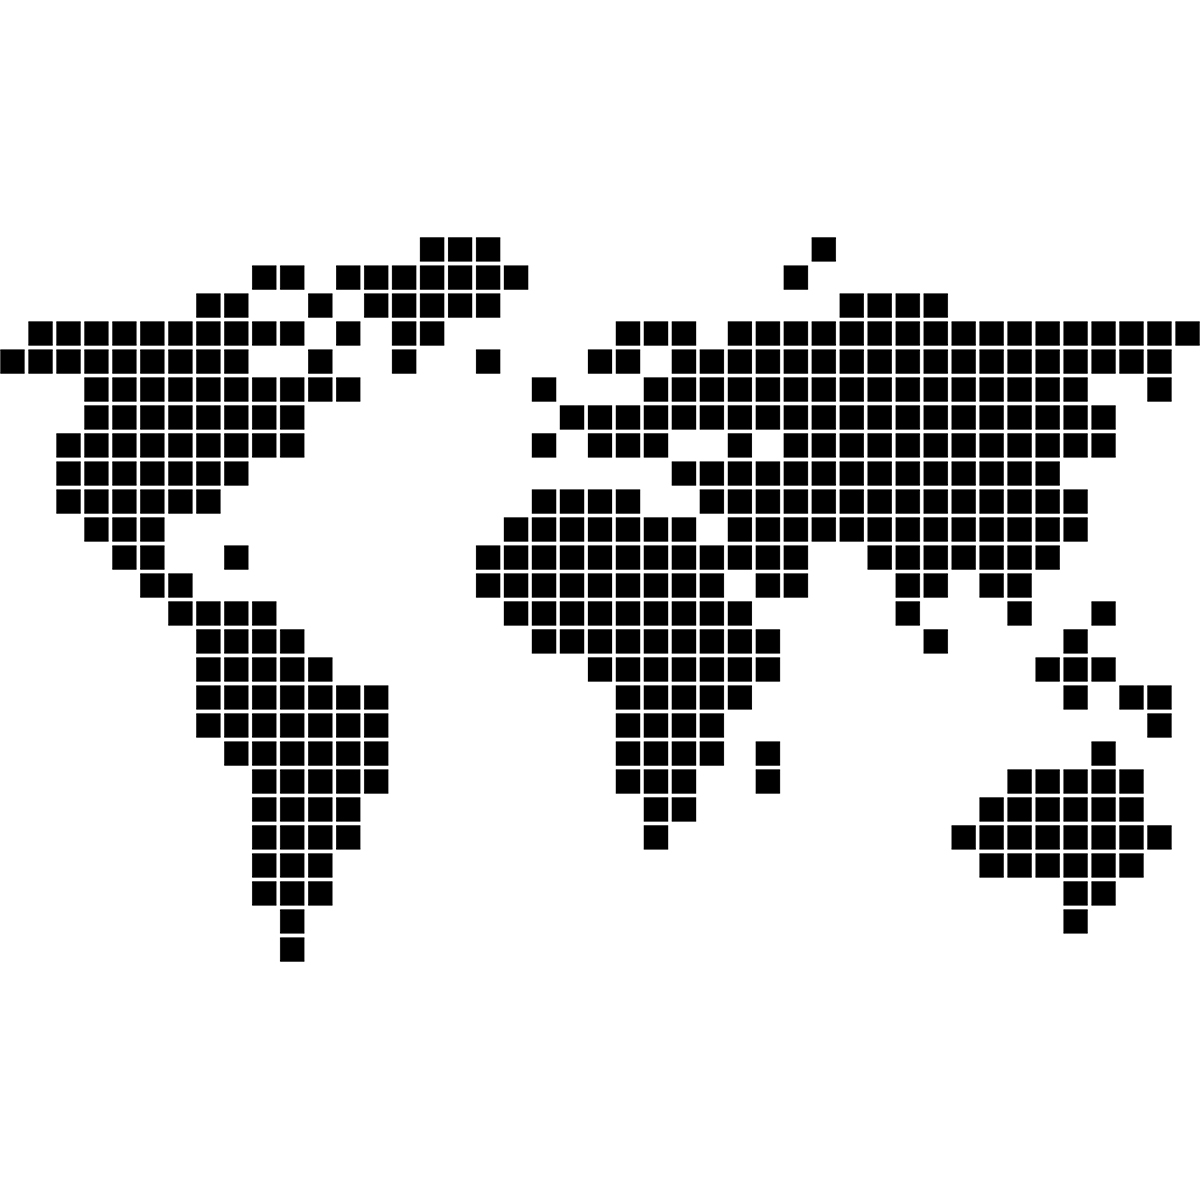 sticker carte du monde en 2d stickers villes et voyages. Black Bedroom Furniture Sets. Home Design Ideas